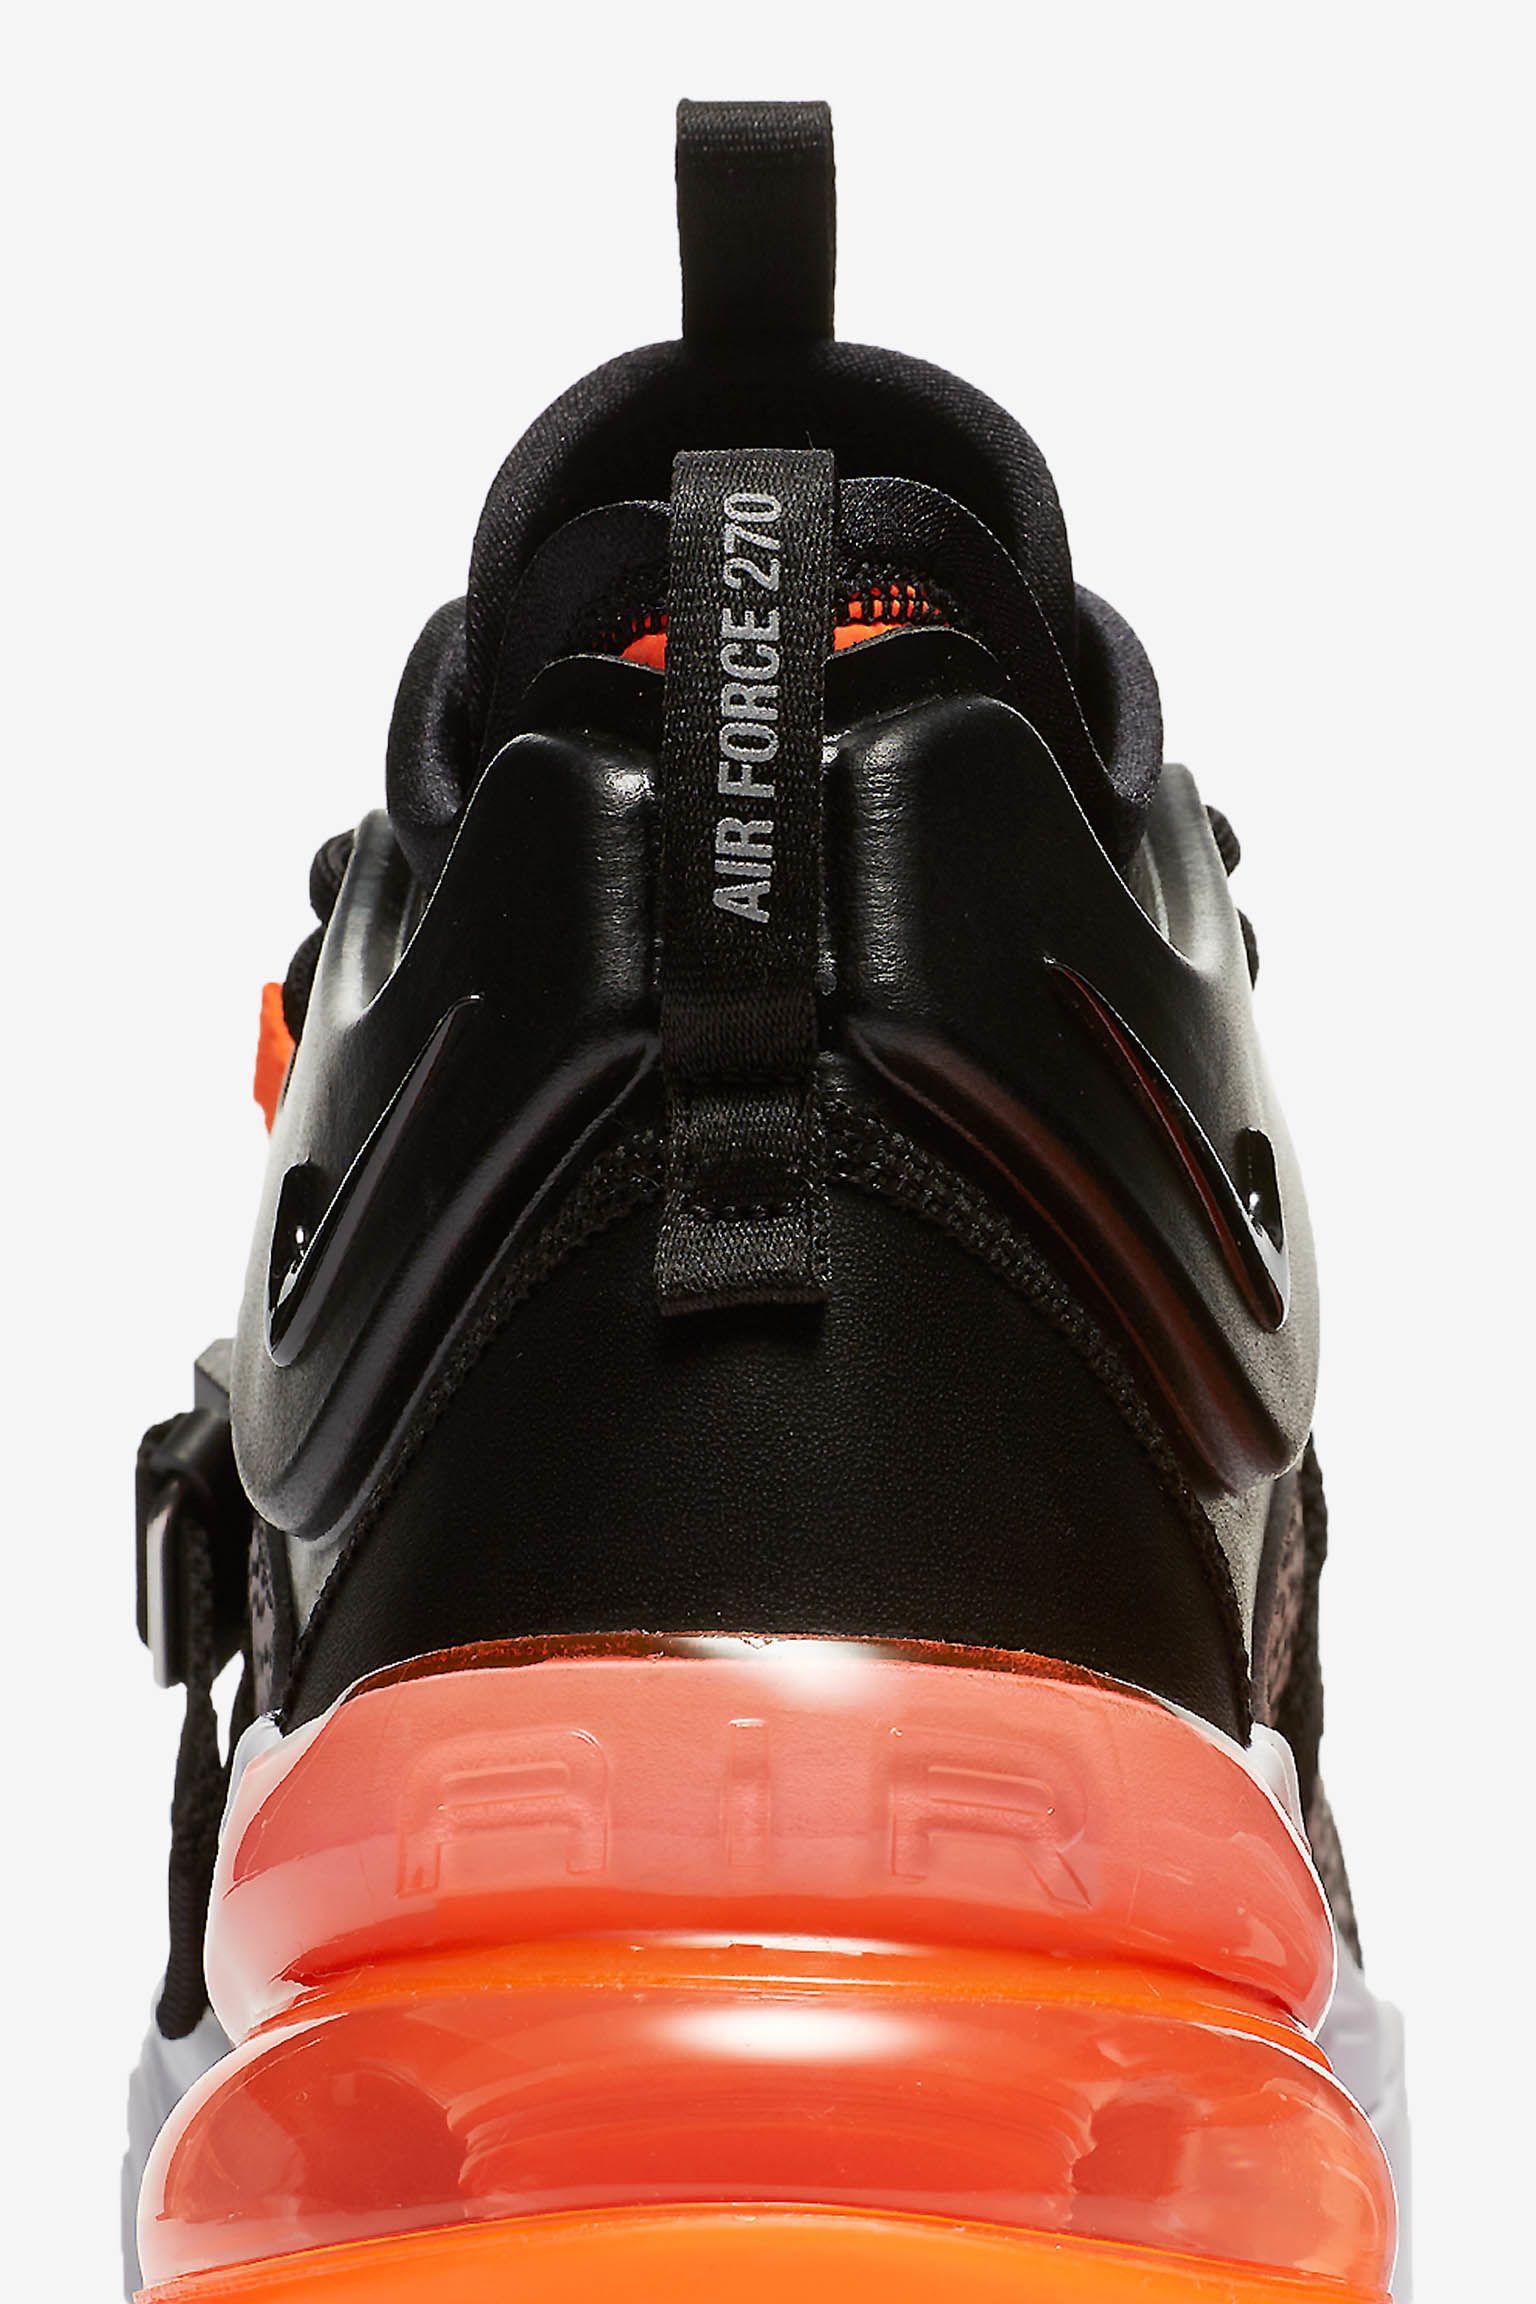 Nike Air Force 270 'Black & Hyper Crimson' Release Date